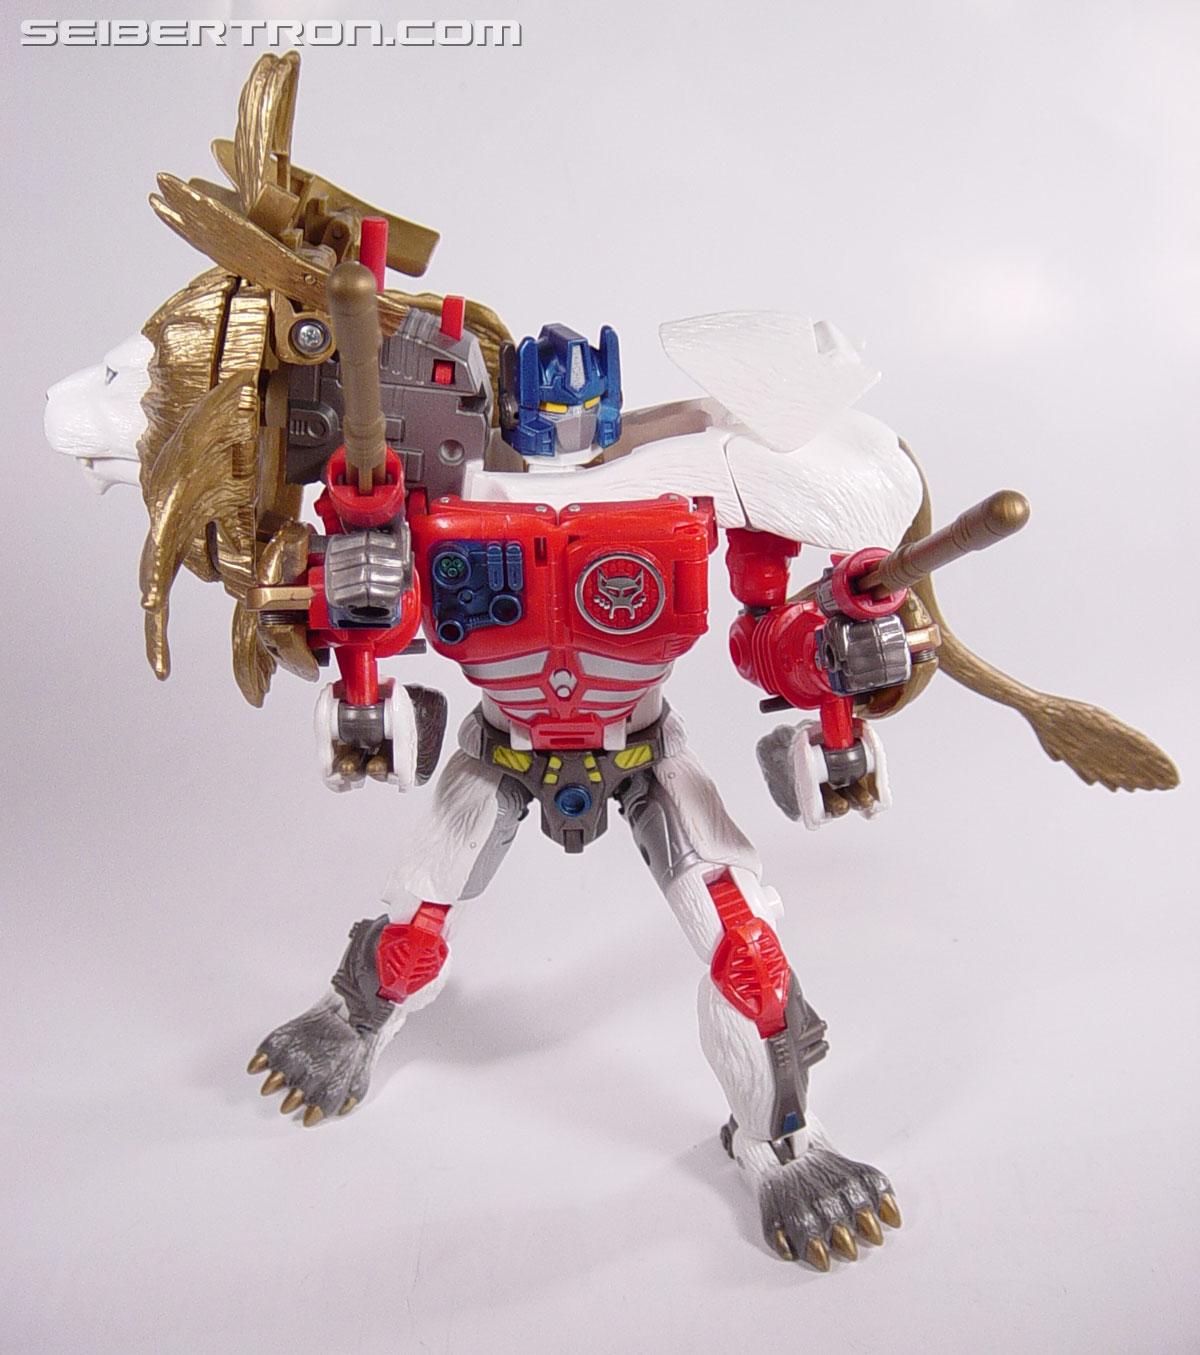 Transformers Beast Wars II Lio Convoy (Image #72 of 81)